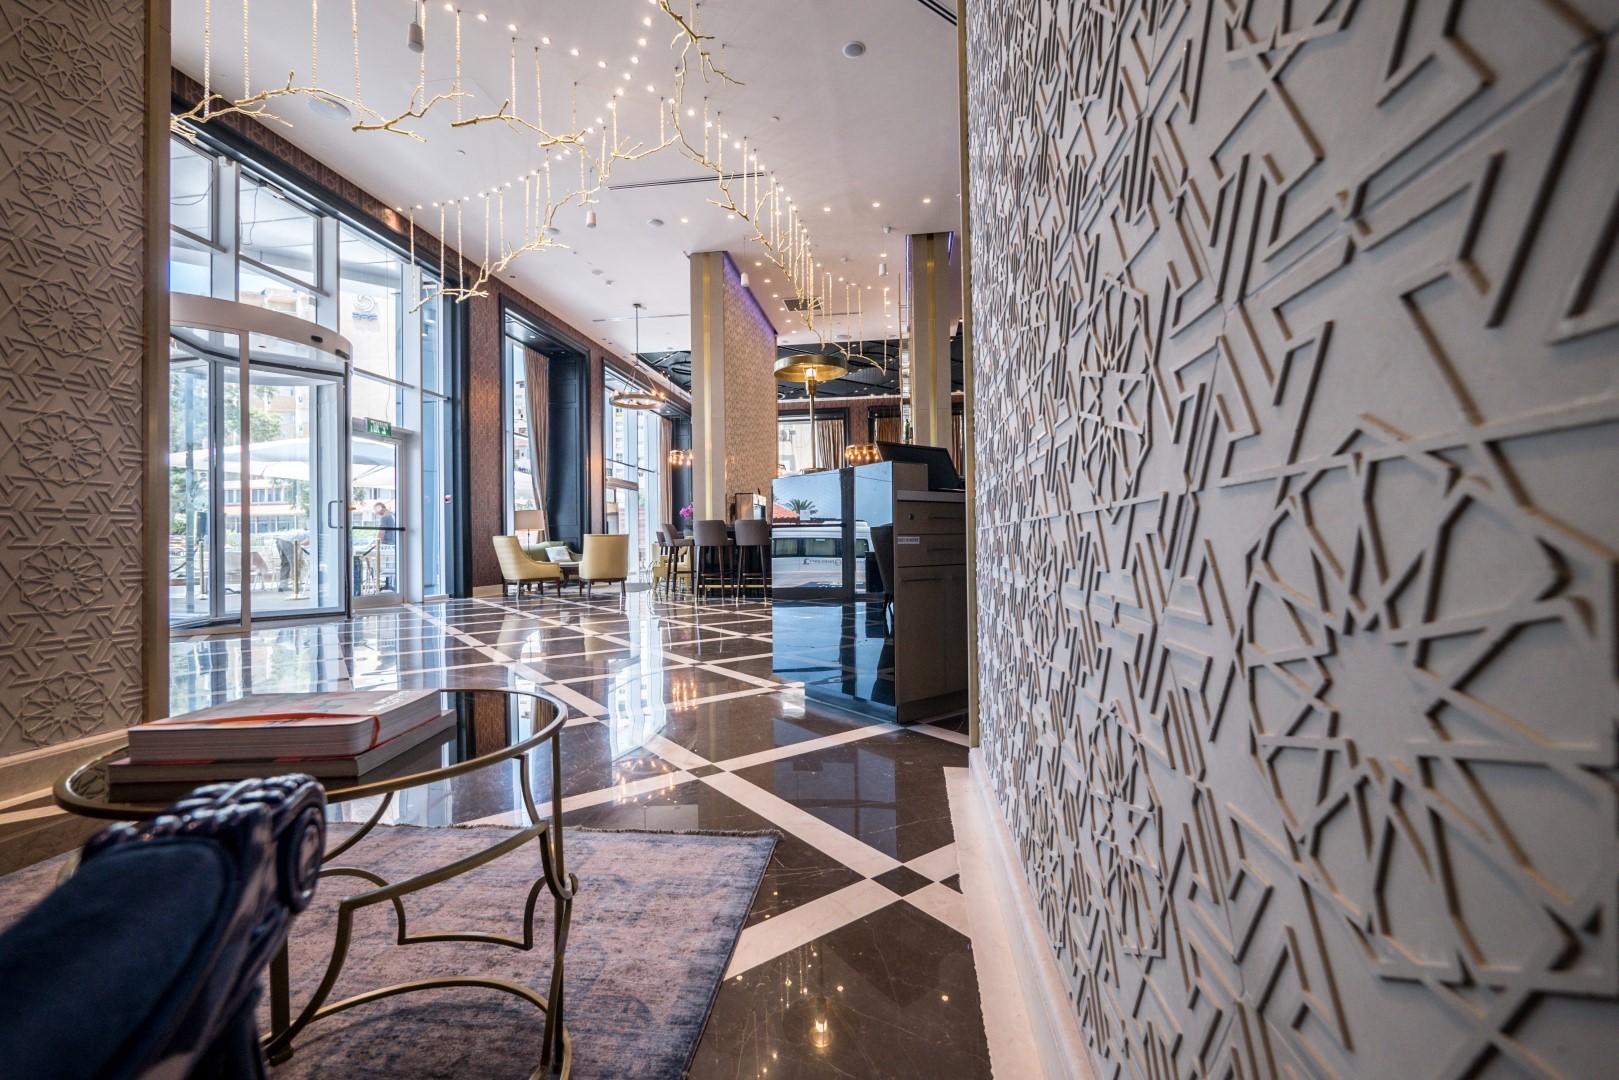 David tower hotel